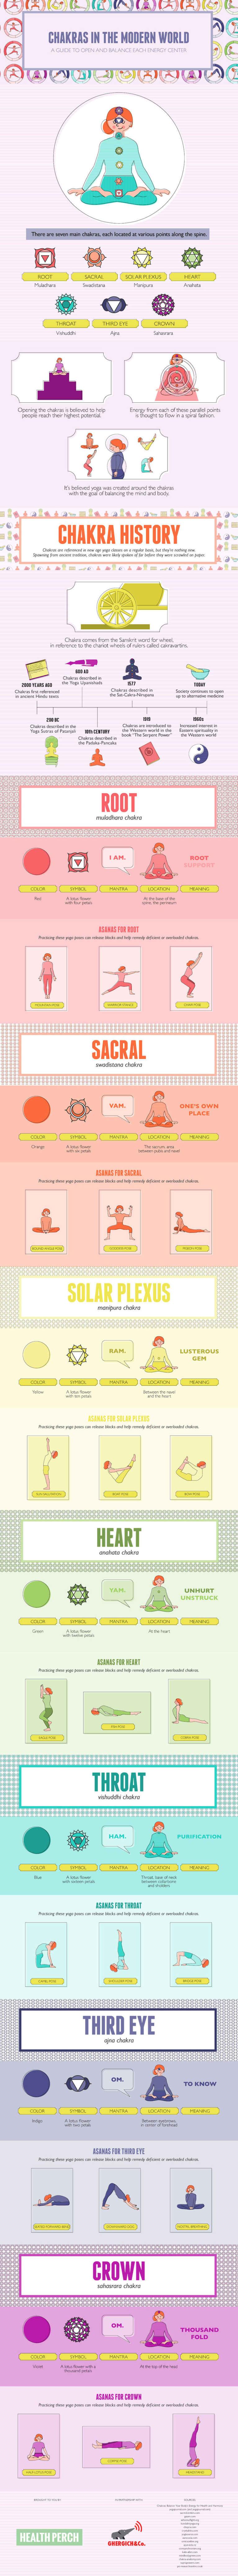 7 yoga poses for chakras